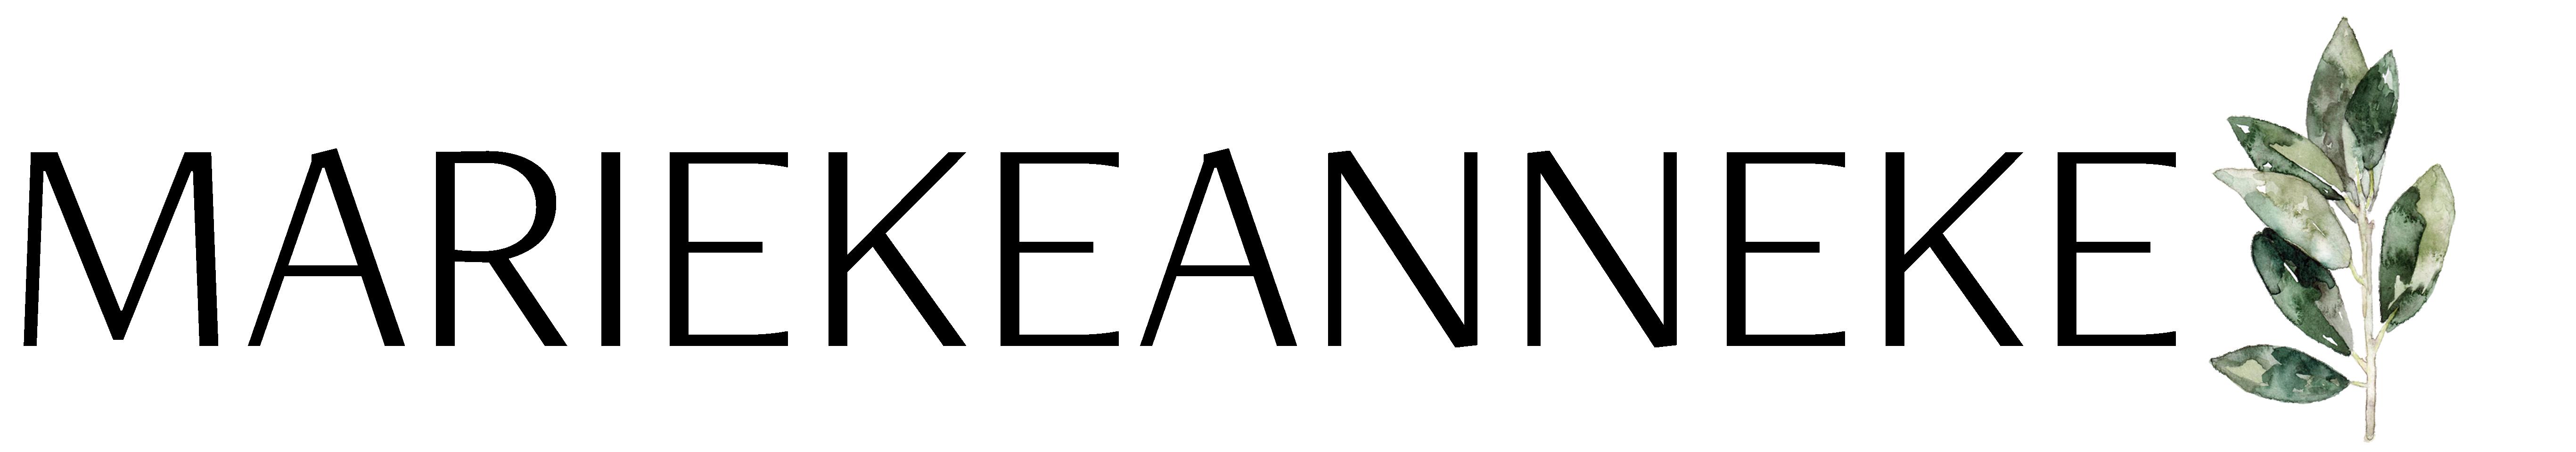 MARIEKEANNEKE